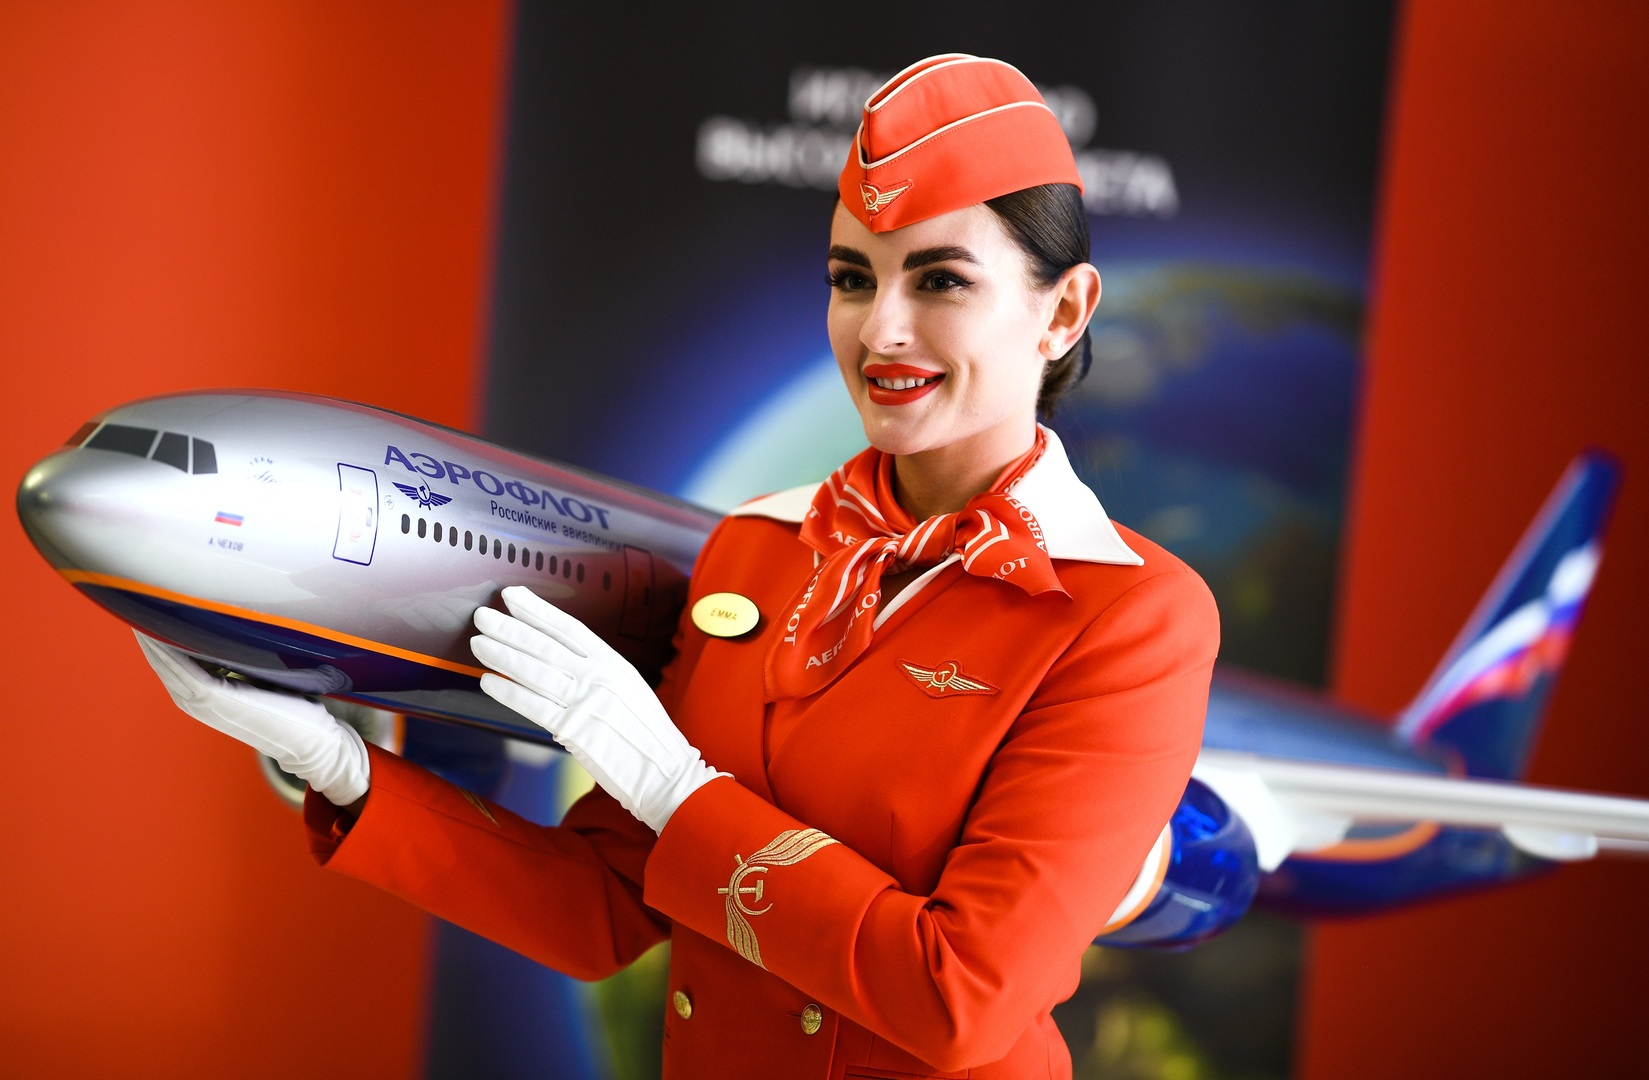 Россиянам разрешат менять авиабилеты на самолет без комиссии